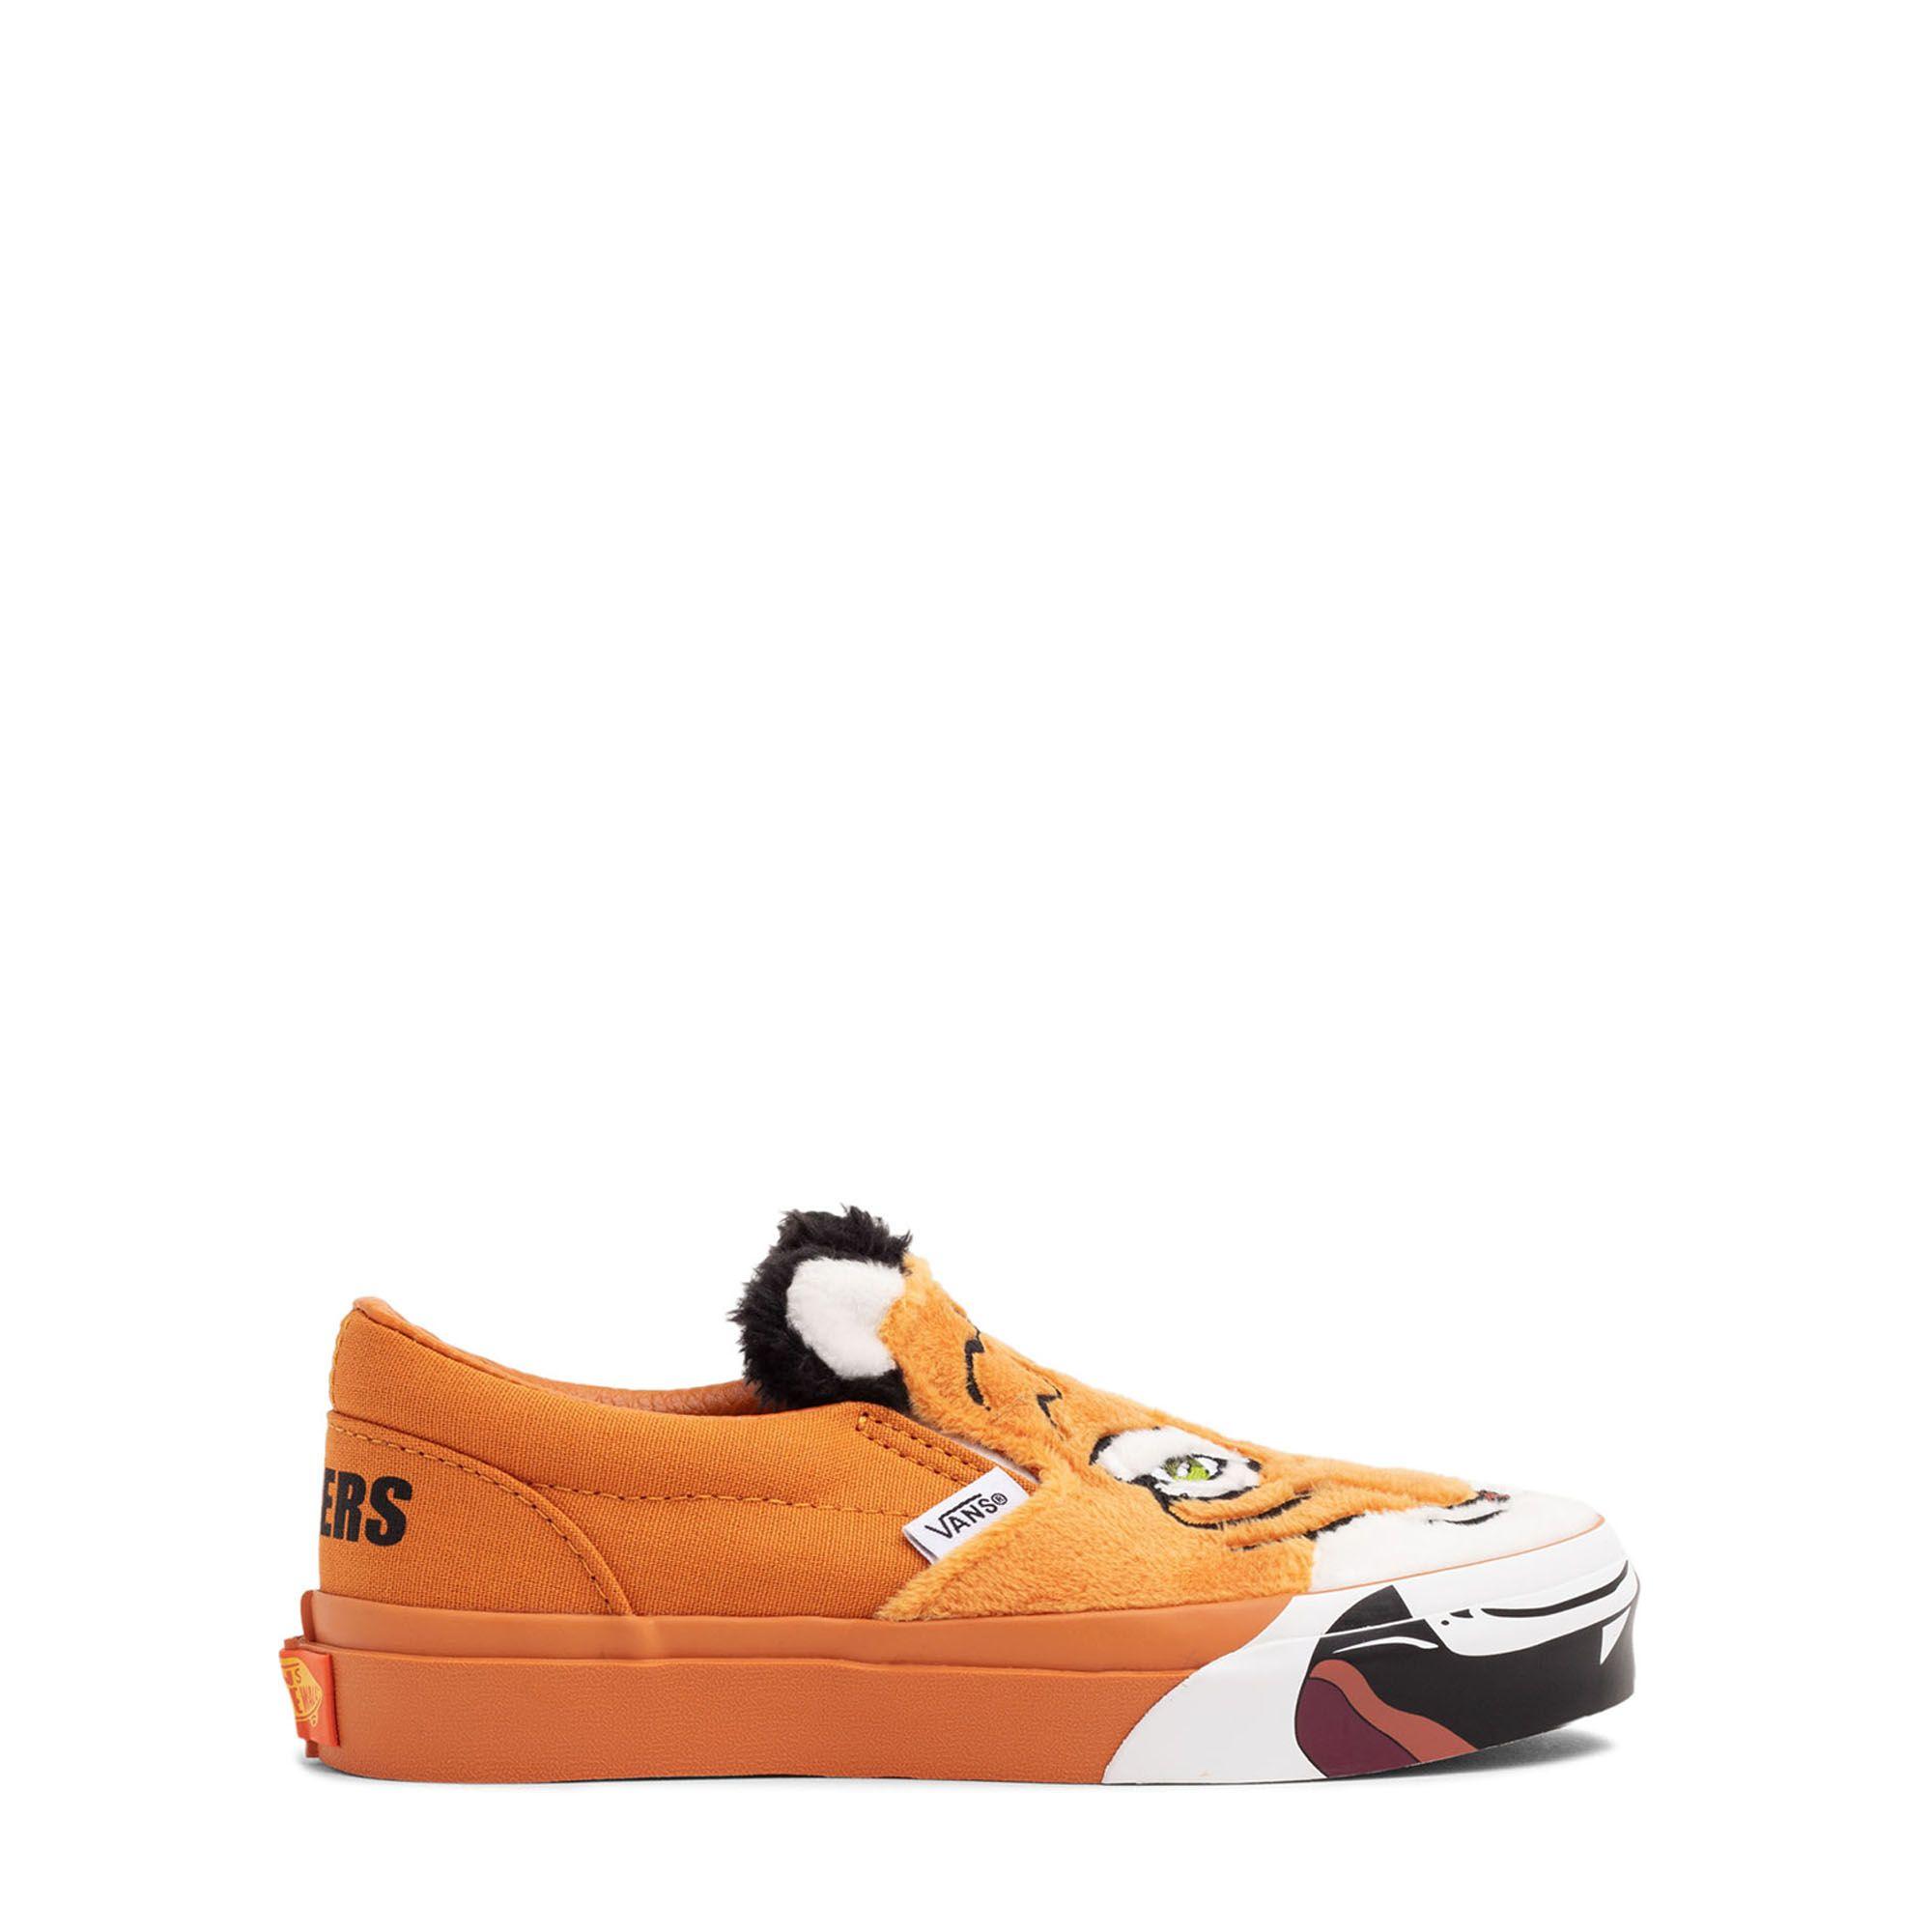 Wild Tiger slip-on sneakers